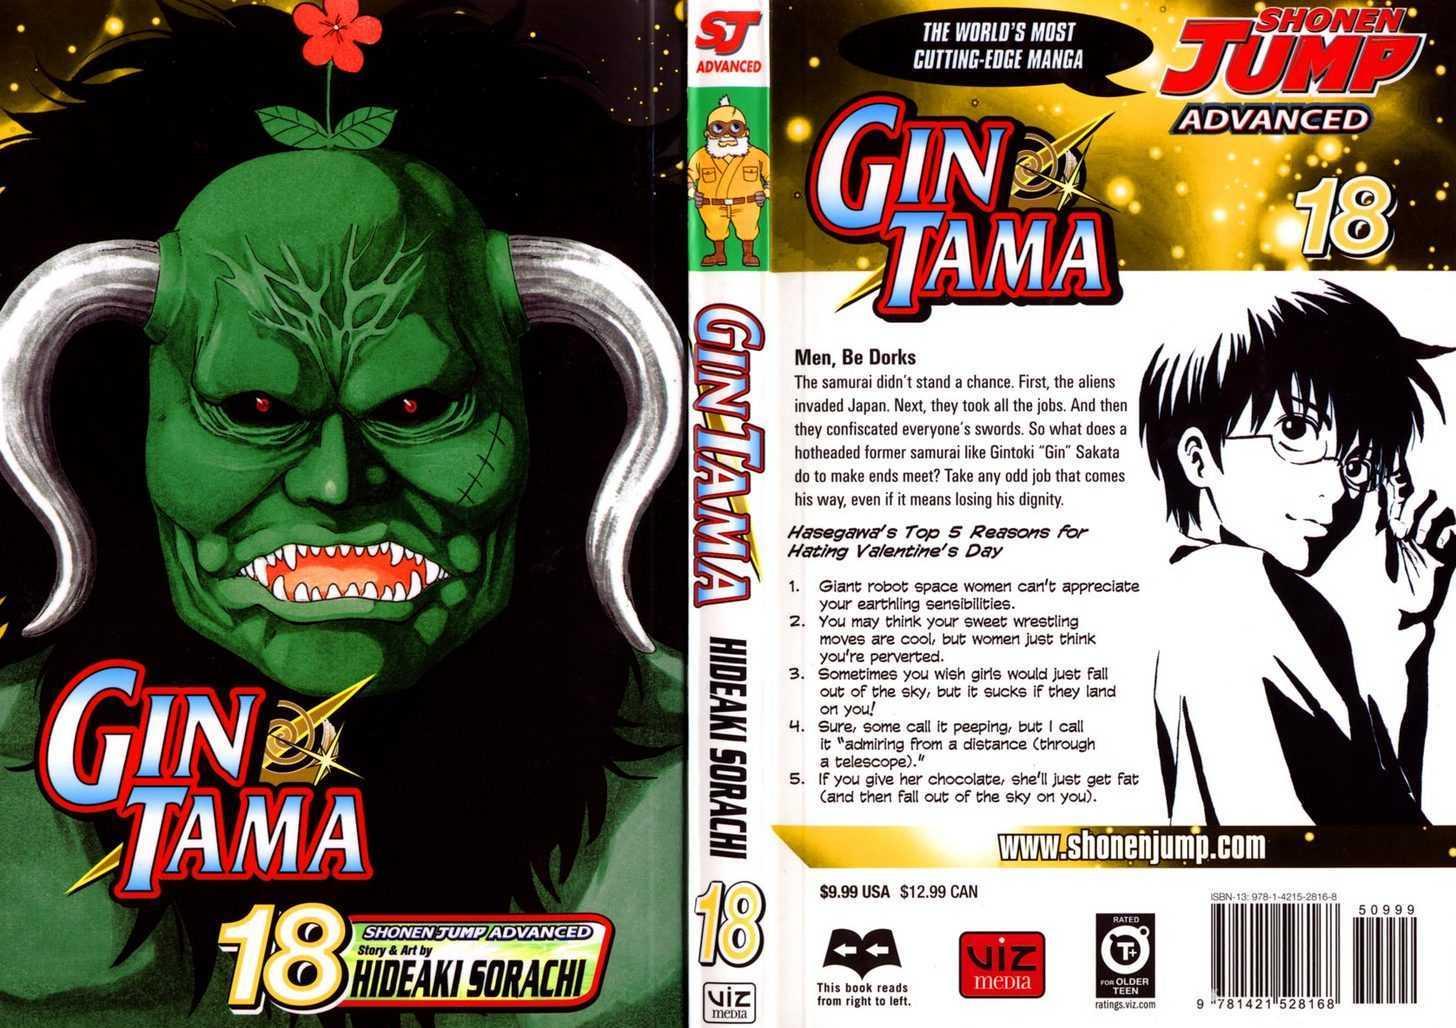 https://im.nineanime.com/comics/pic9/18/210/16657/Gintama1490715.jpg Page 1